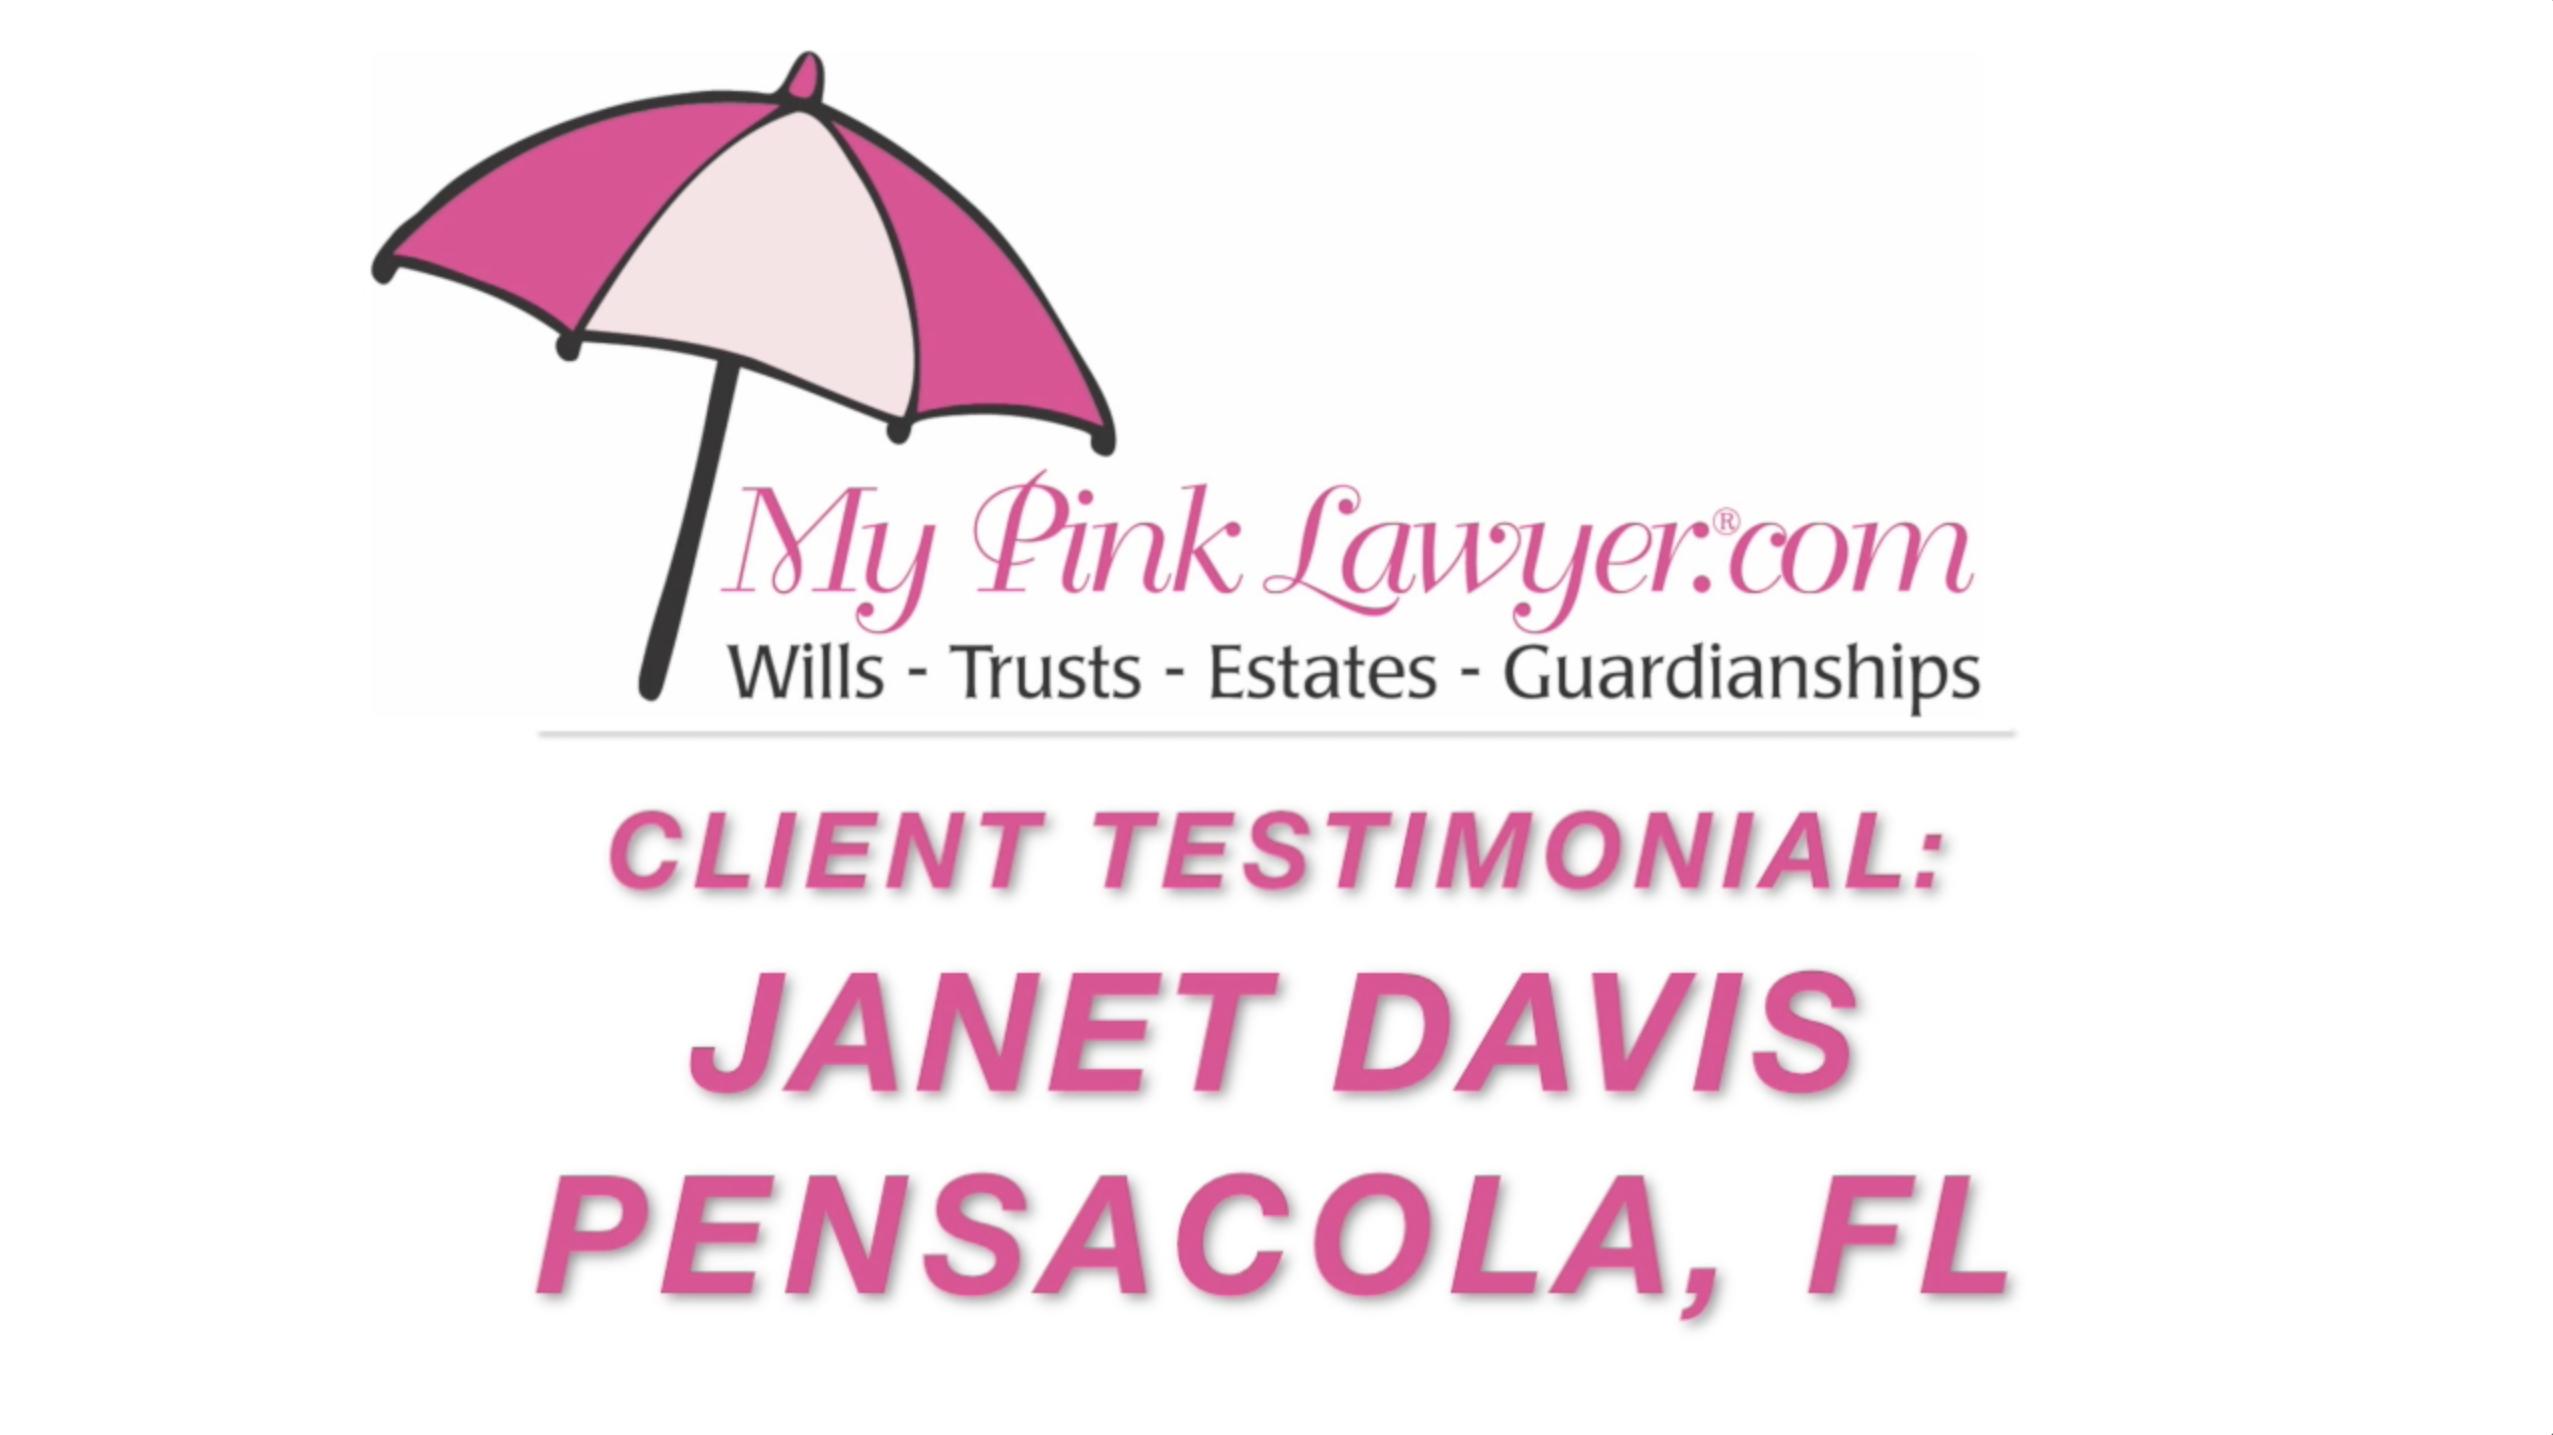 Janet Davis, Pensacola